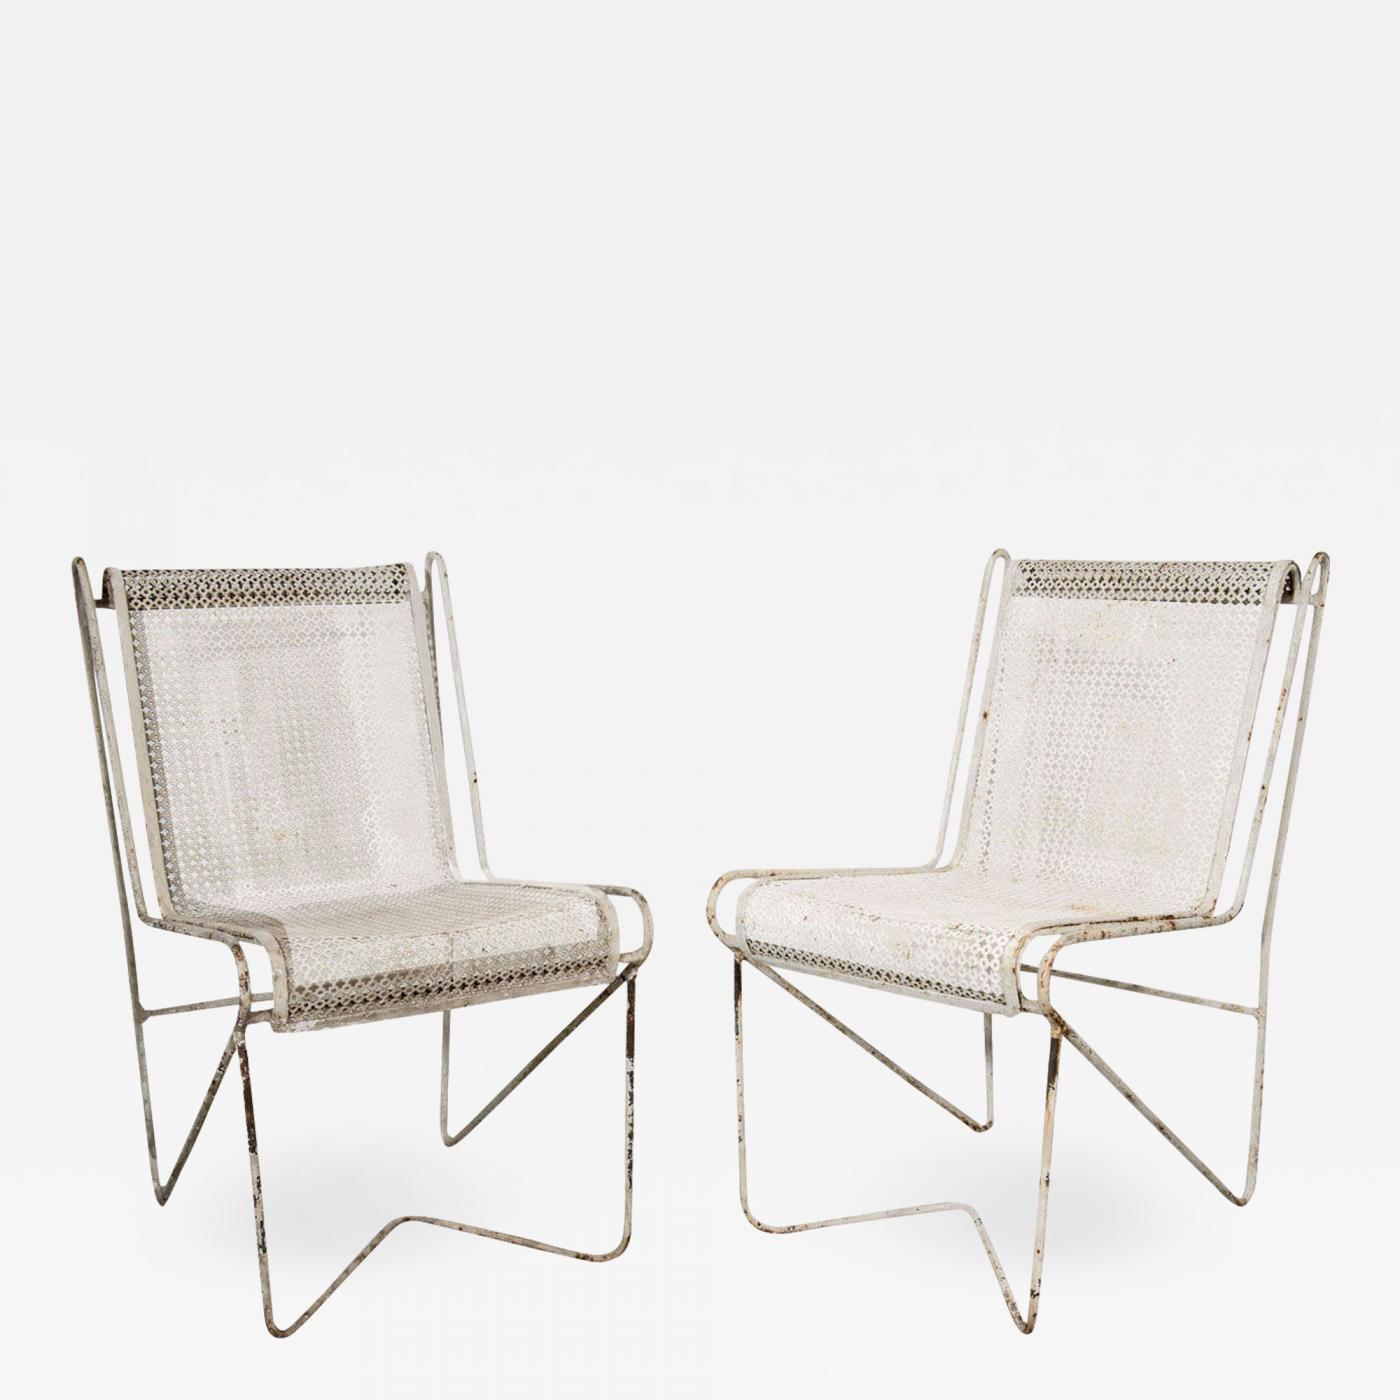 Fantastic Mathieu Mategot Mathieu Mategot Enameled Steel Casablanca Dining Chairs Caraccident5 Cool Chair Designs And Ideas Caraccident5Info